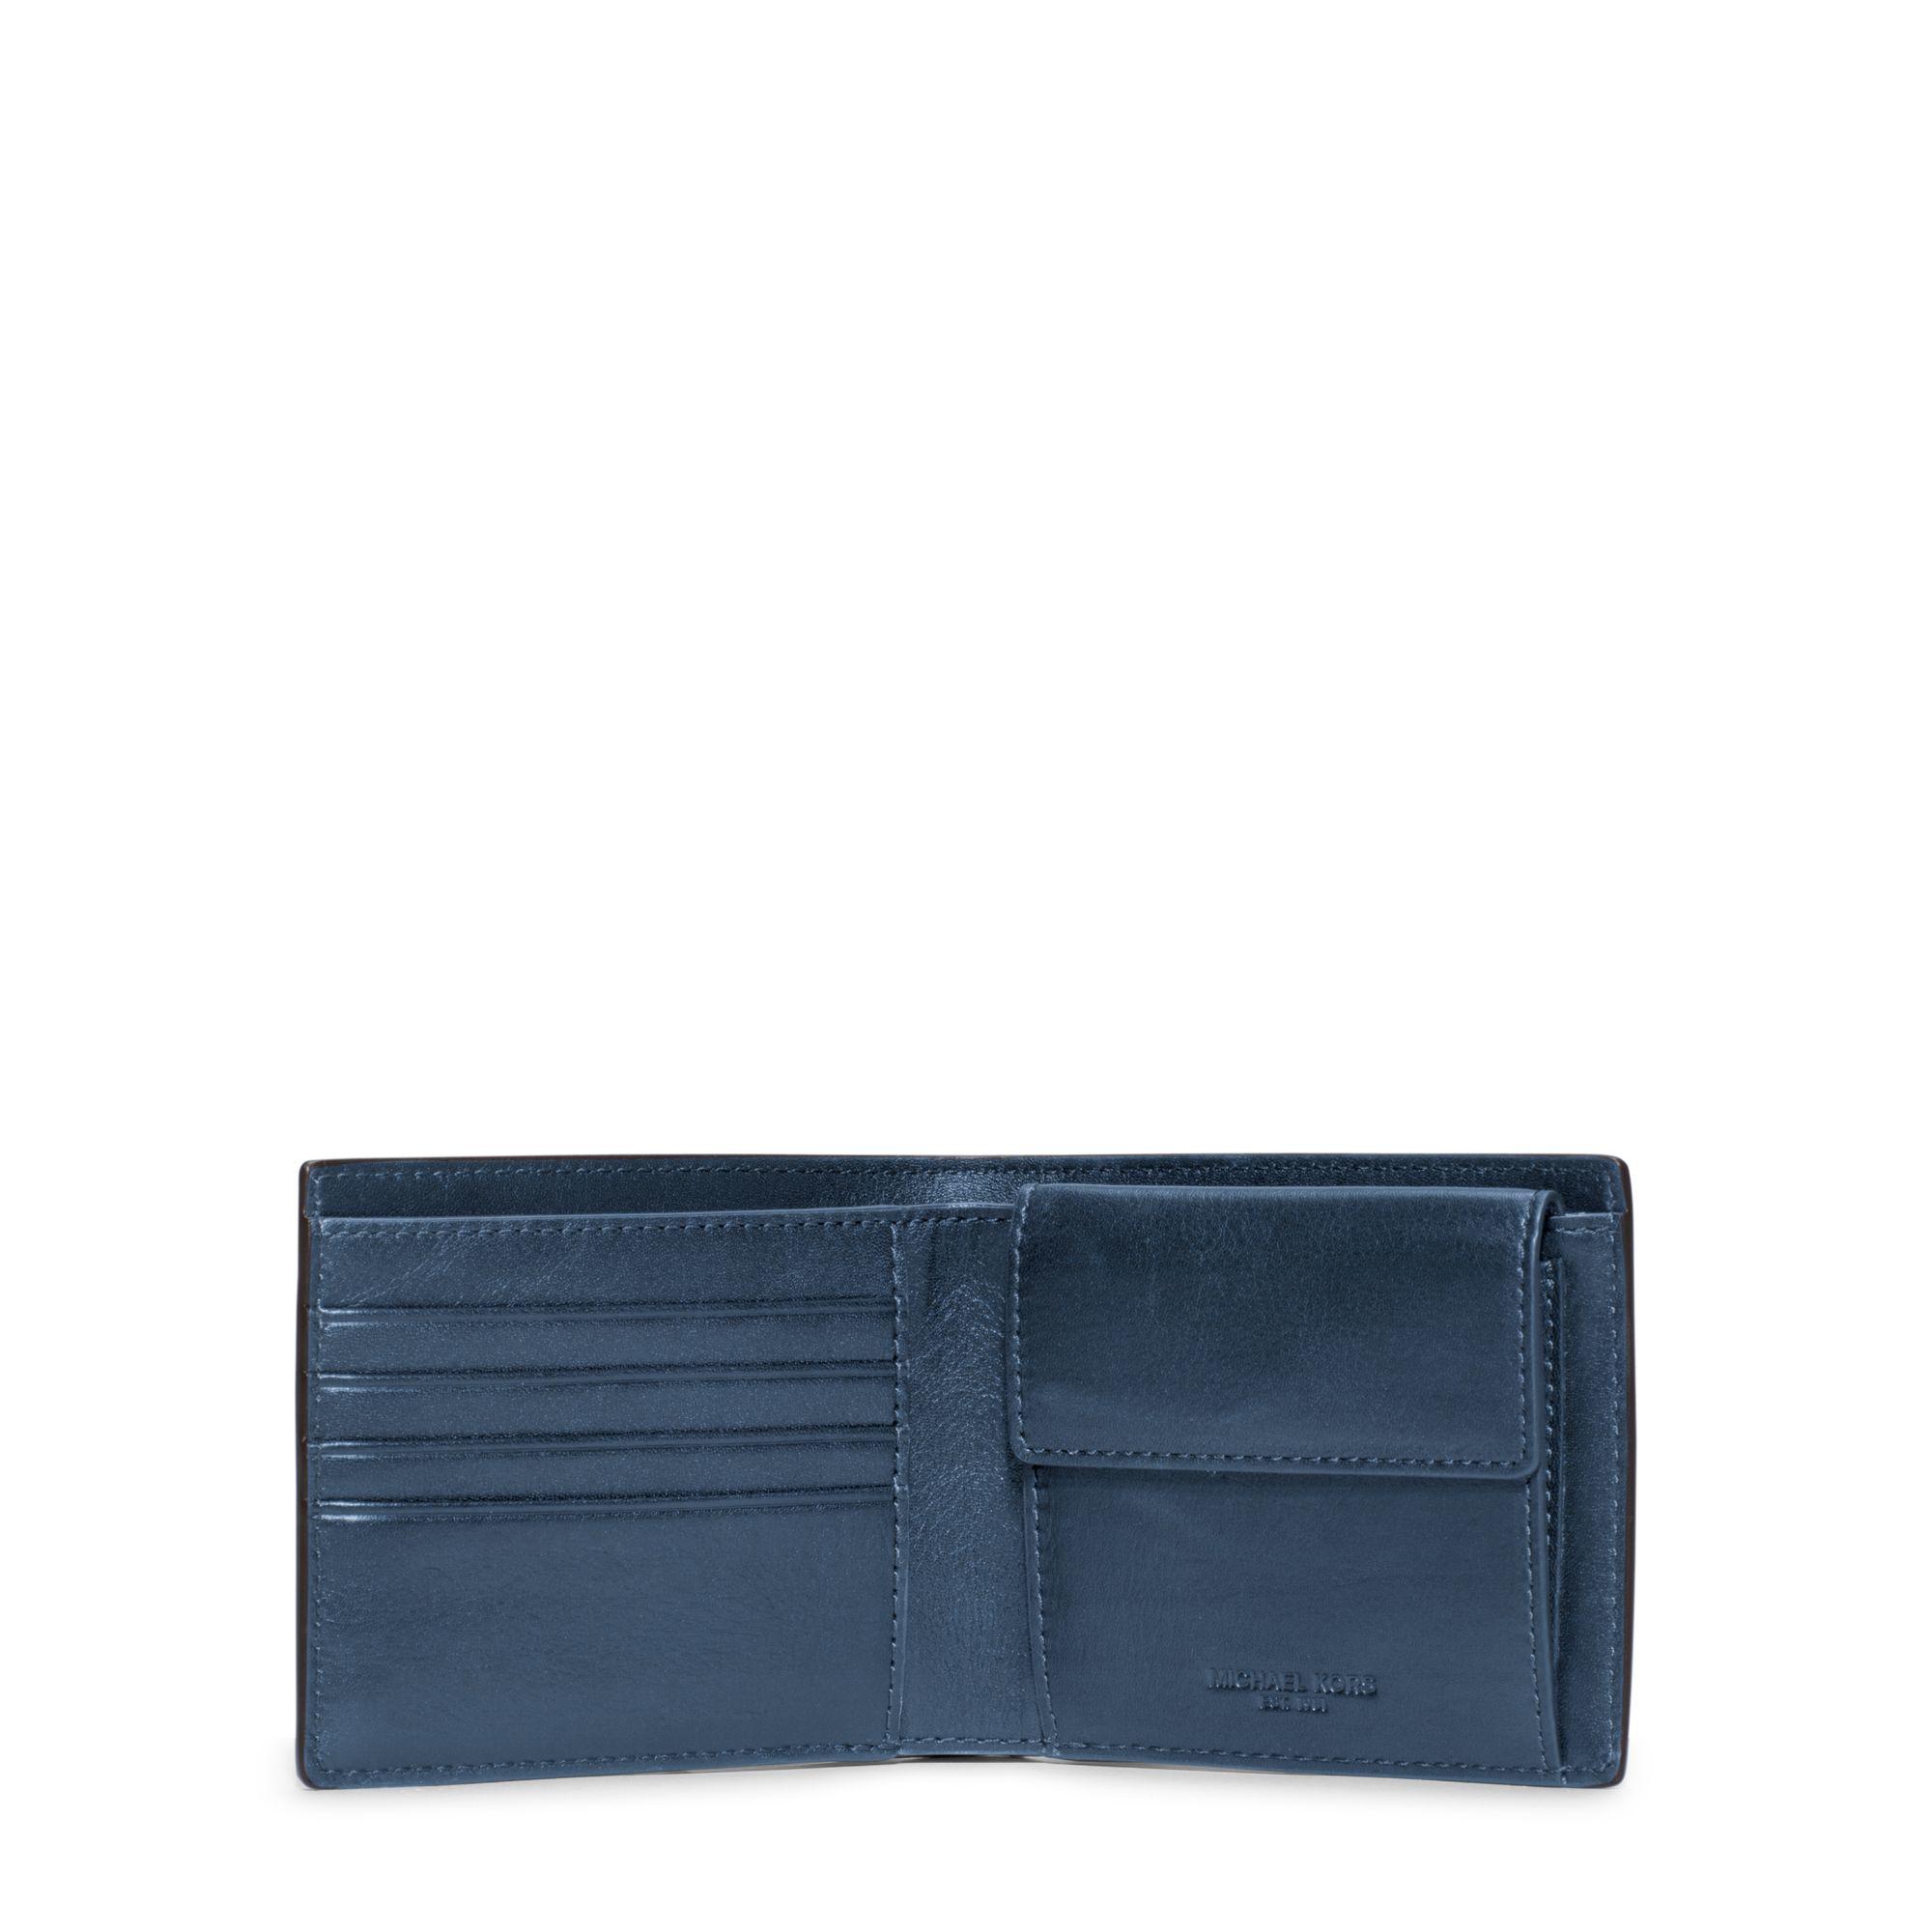 af1aa6968cefb3 Michael Kors Bryant Coin-pocket Embossed-leather Billfold Wallet in ...